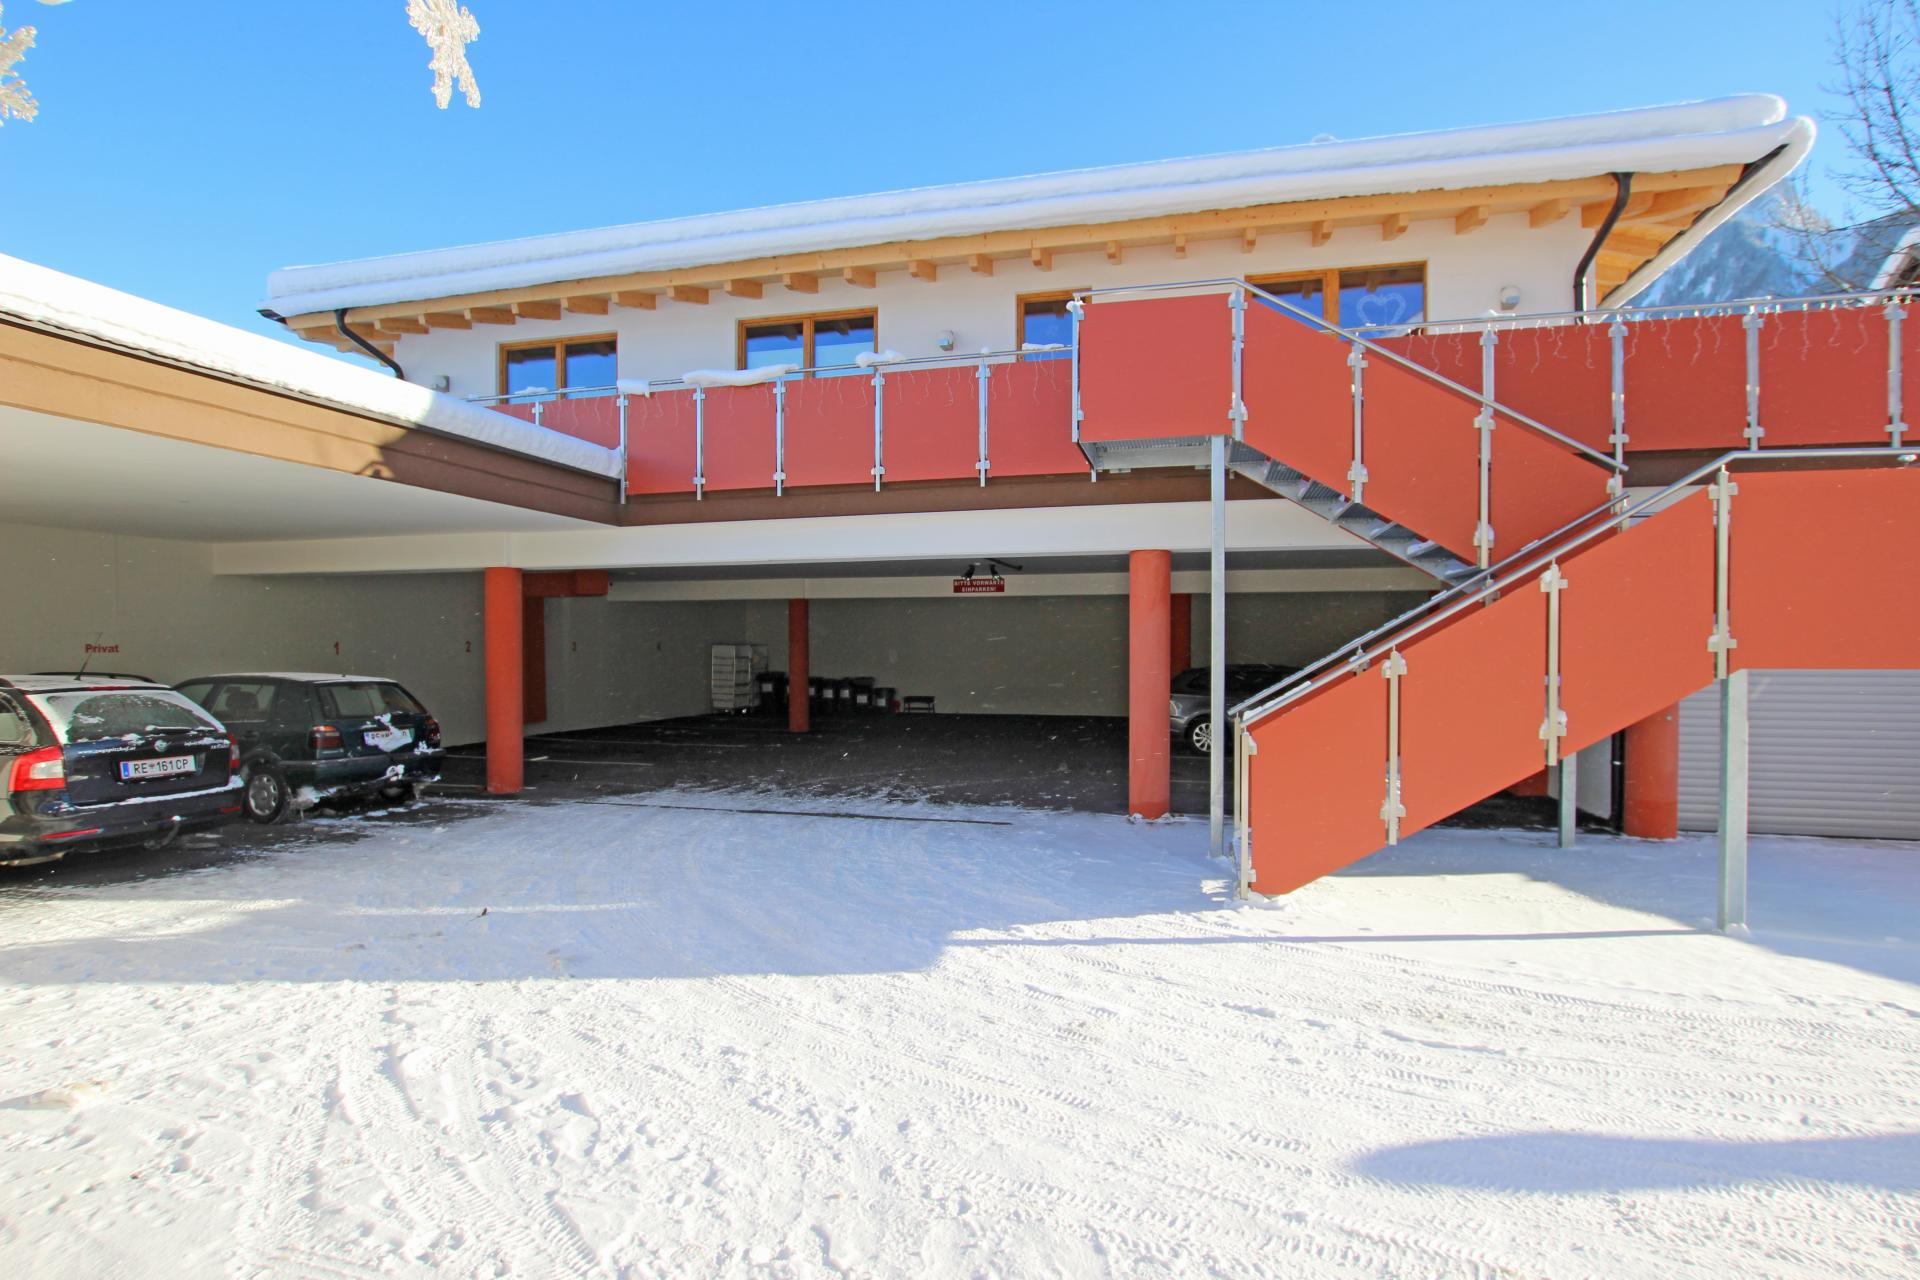 4 Sterne Zugspitzhof Ehrwald #Bildergalerie#Winter#Corona